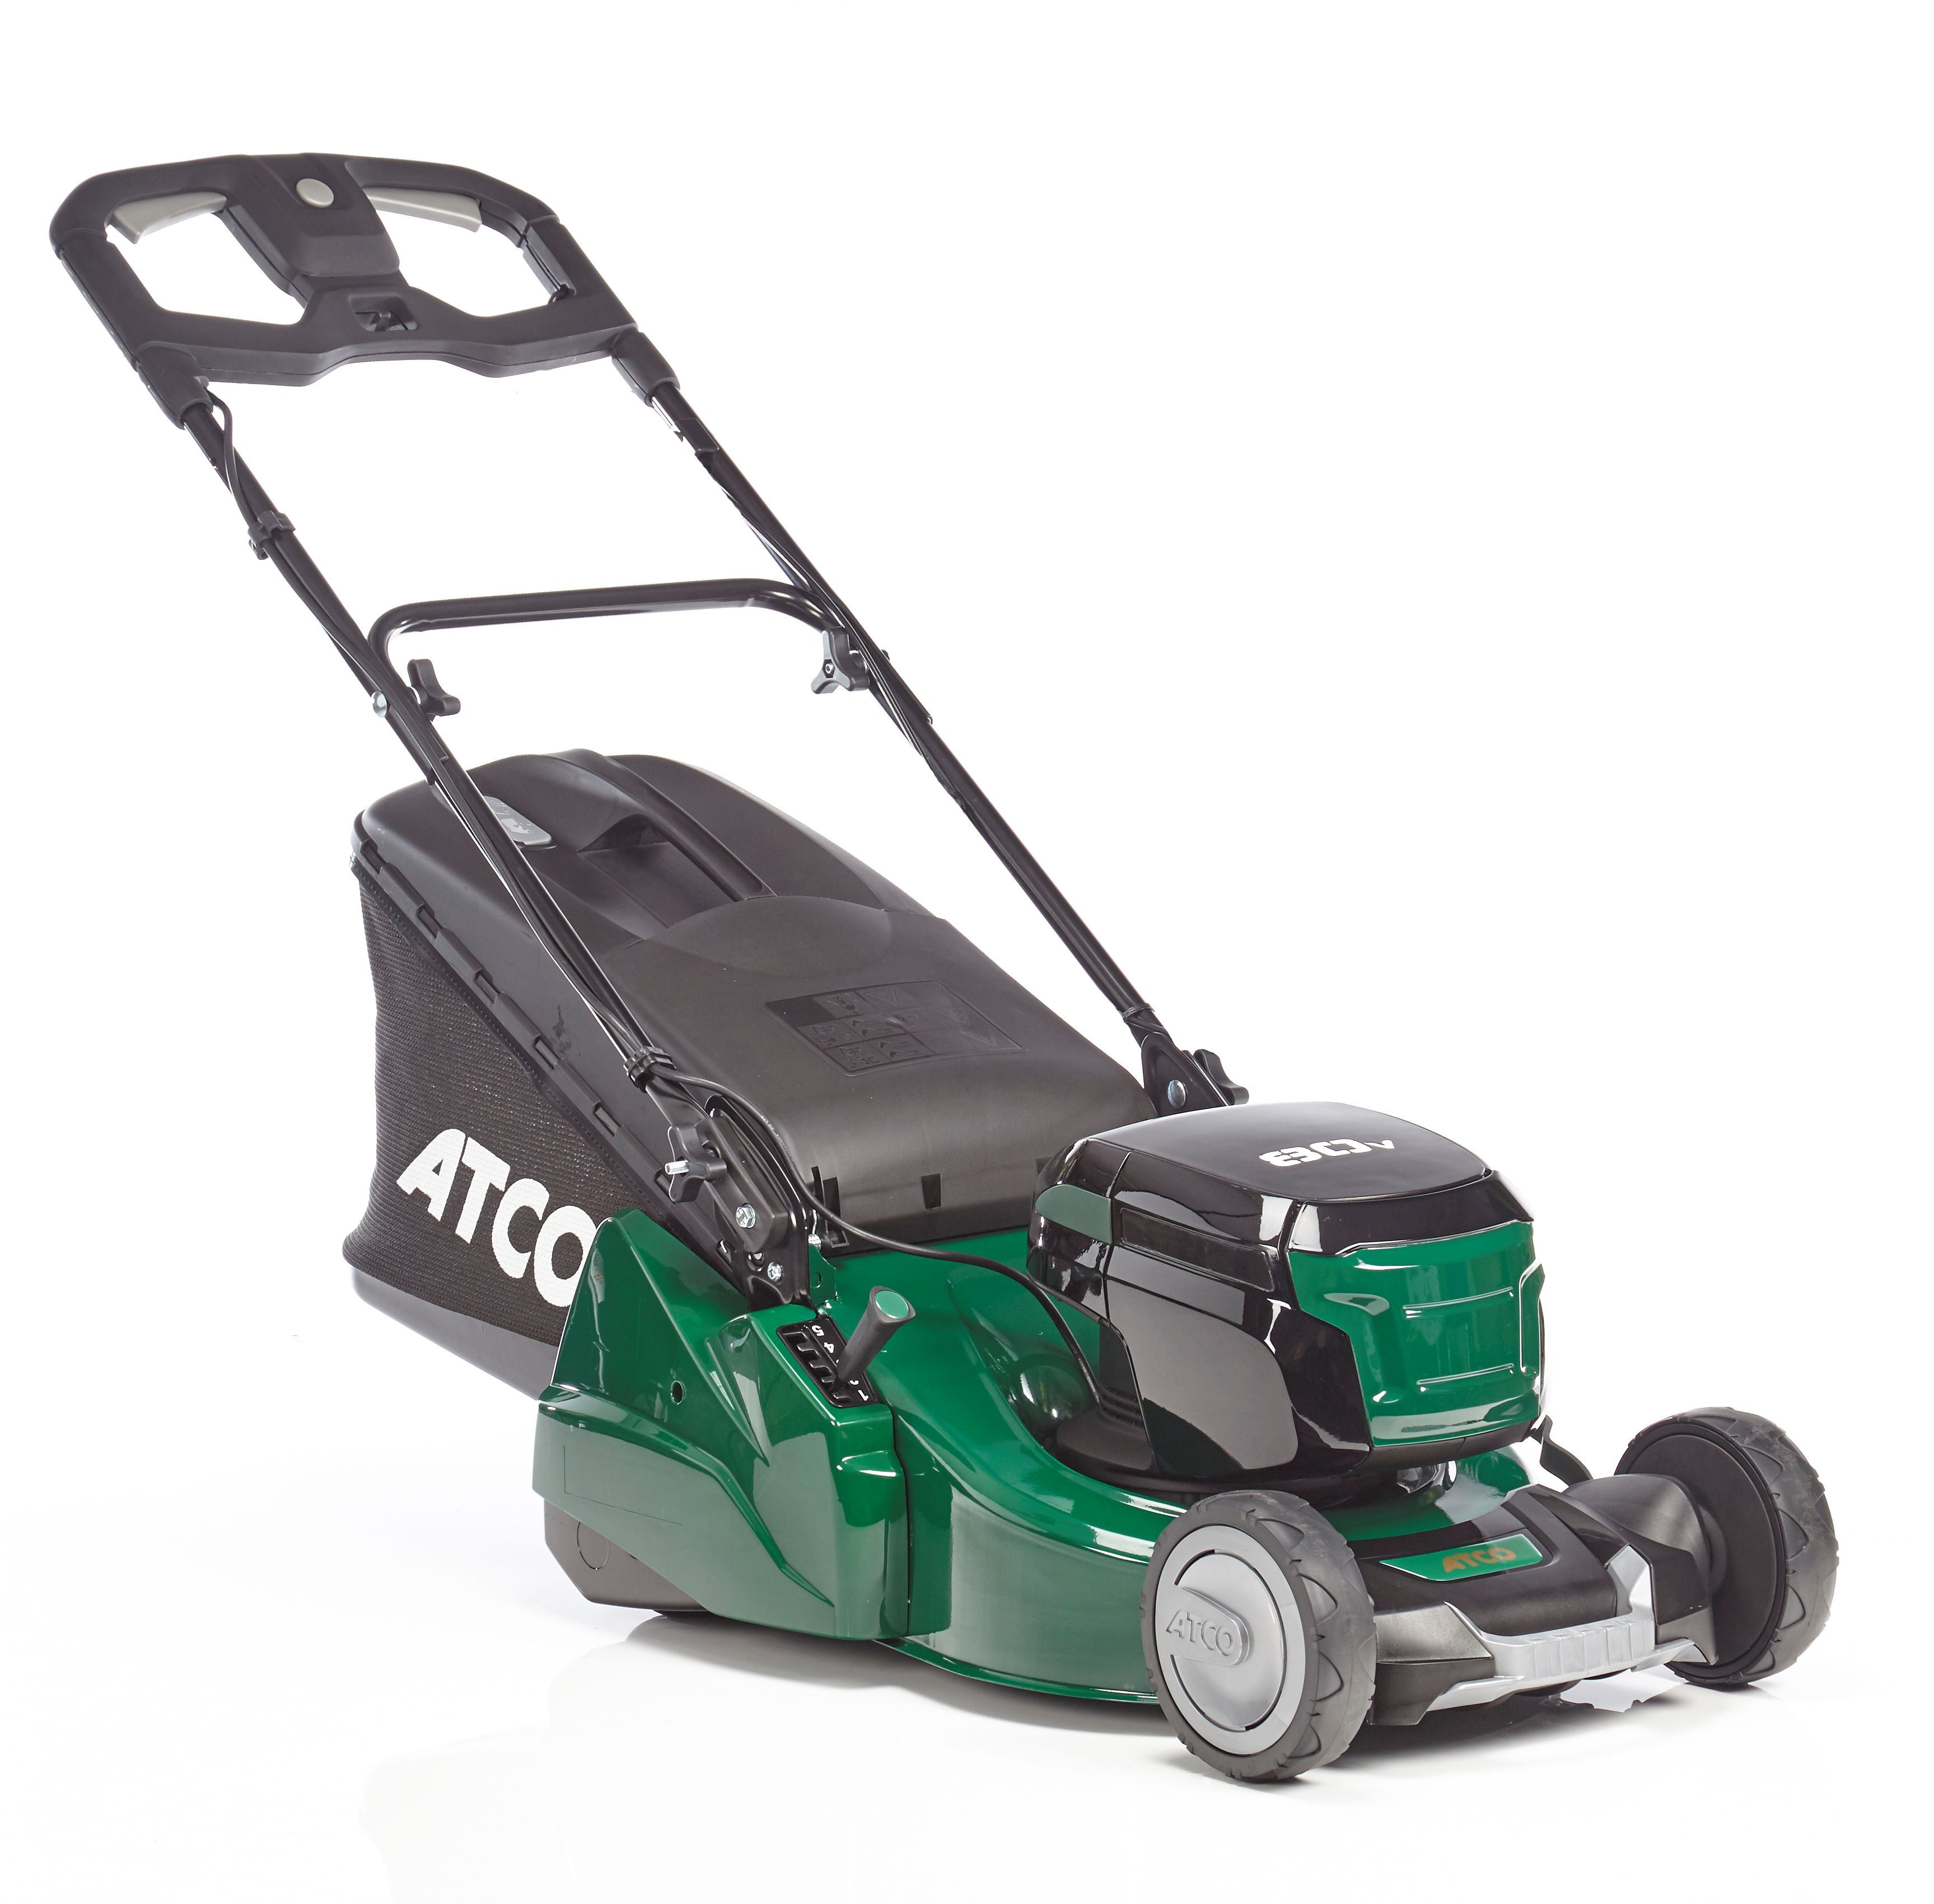 Atco Liner 16 Li